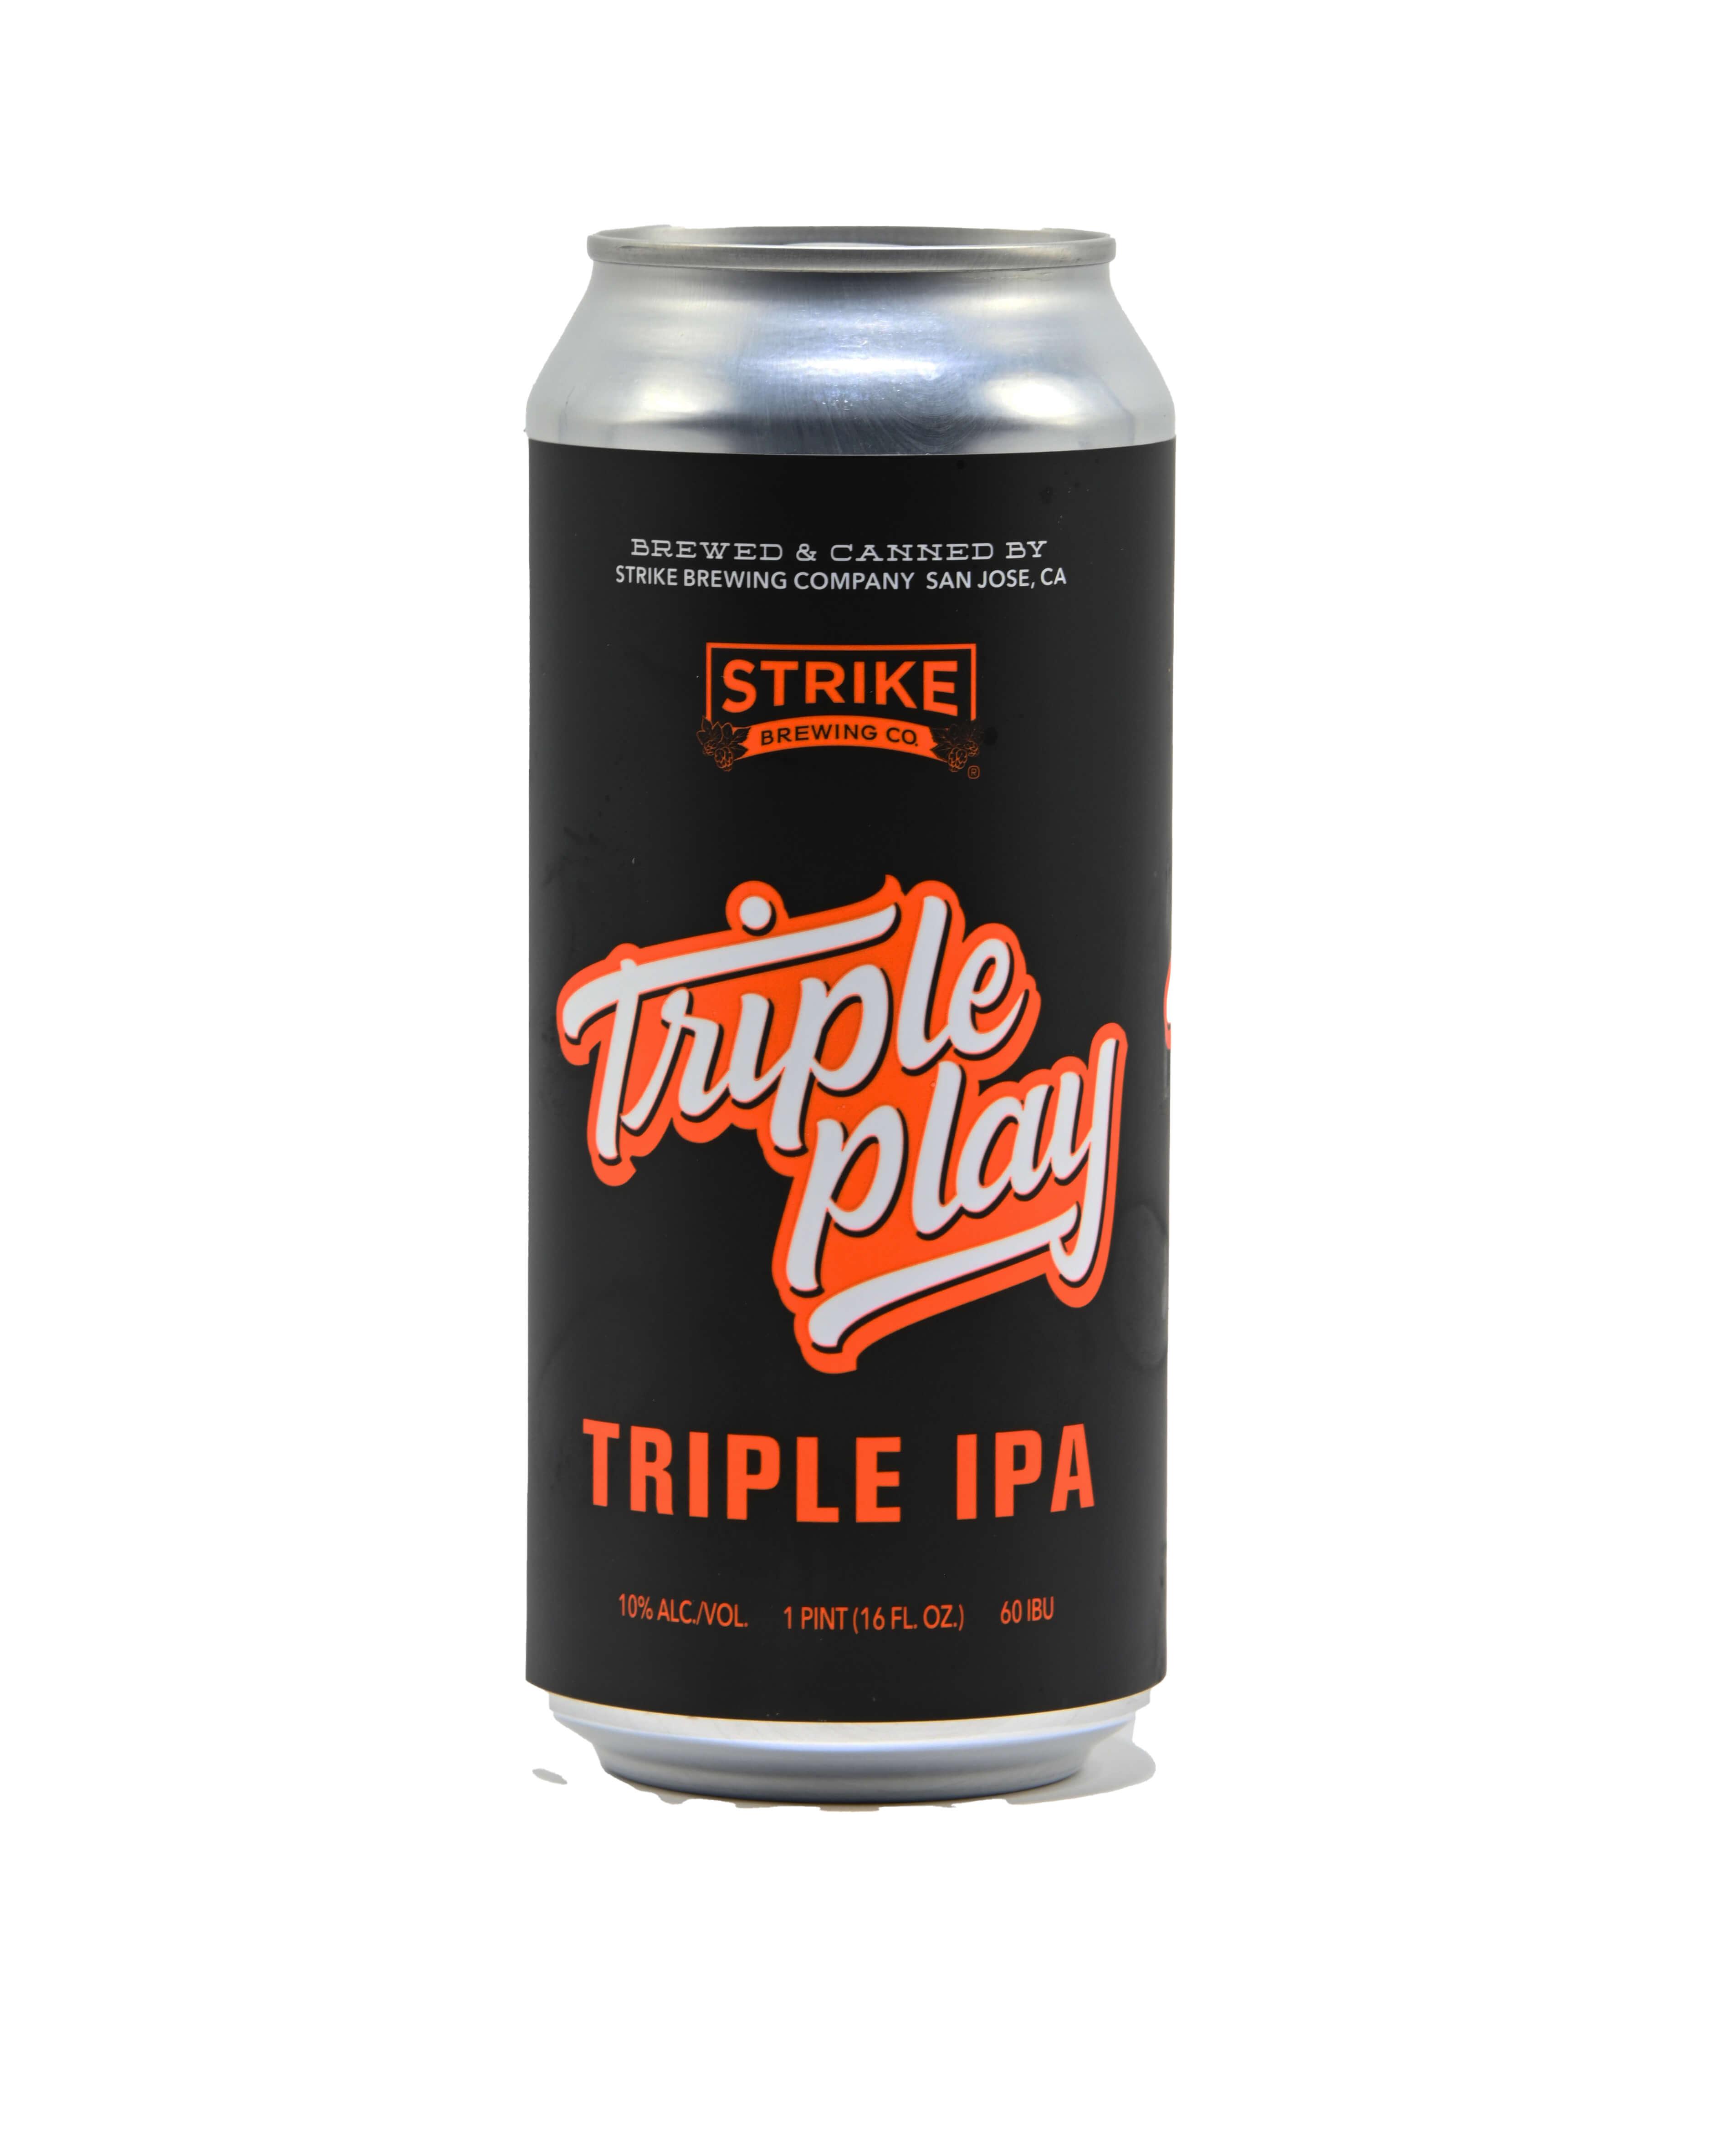 Strike Triple Play Triple IPA Bottleshot